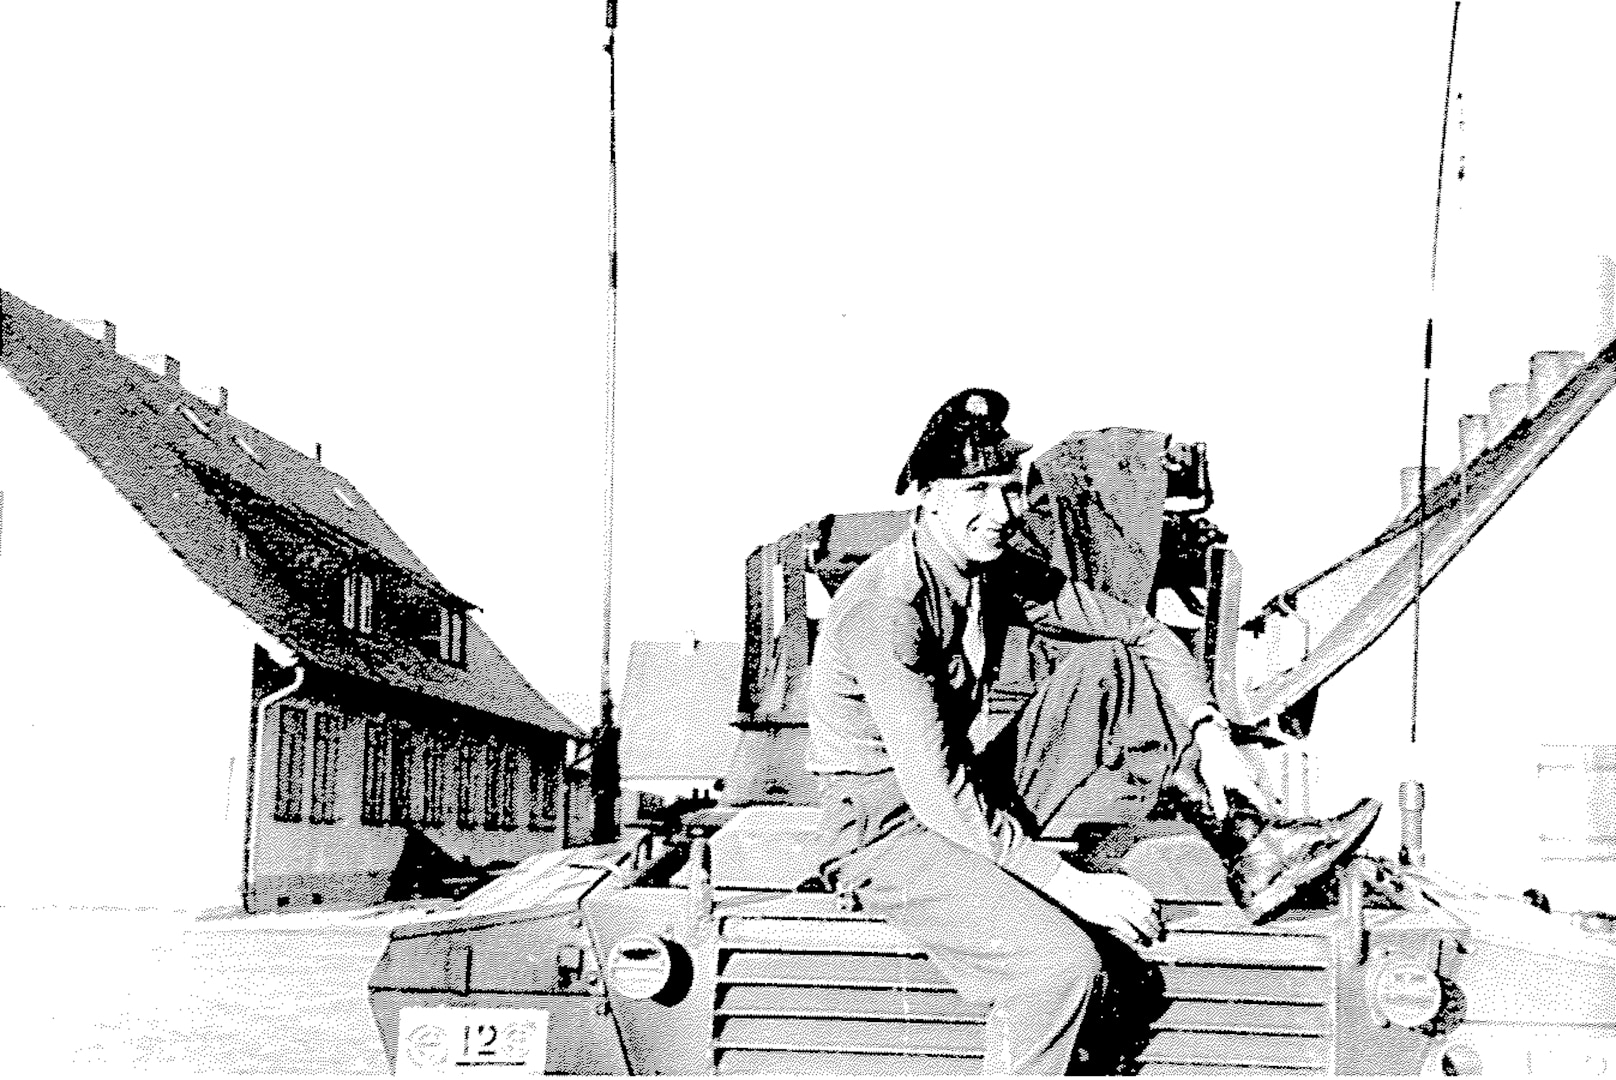 Sgt. Ervin A. Fricke